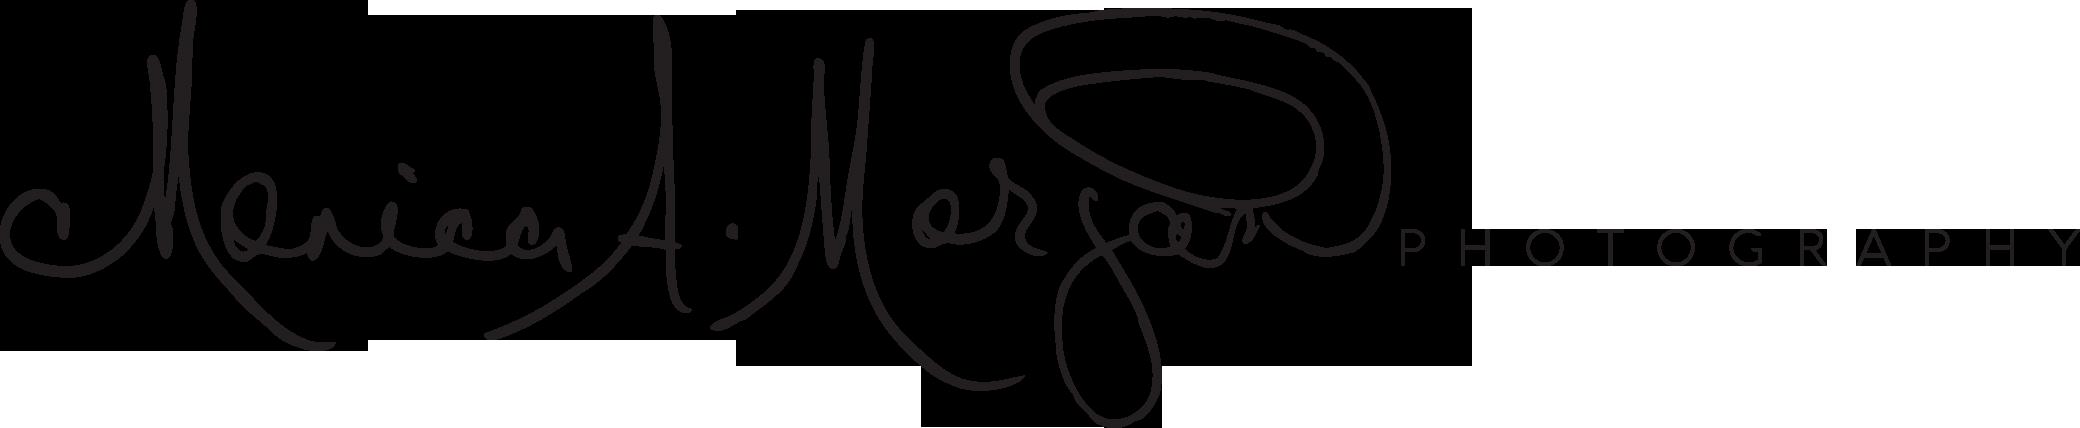 monica morgan signature logo horizontalblack9.12.17